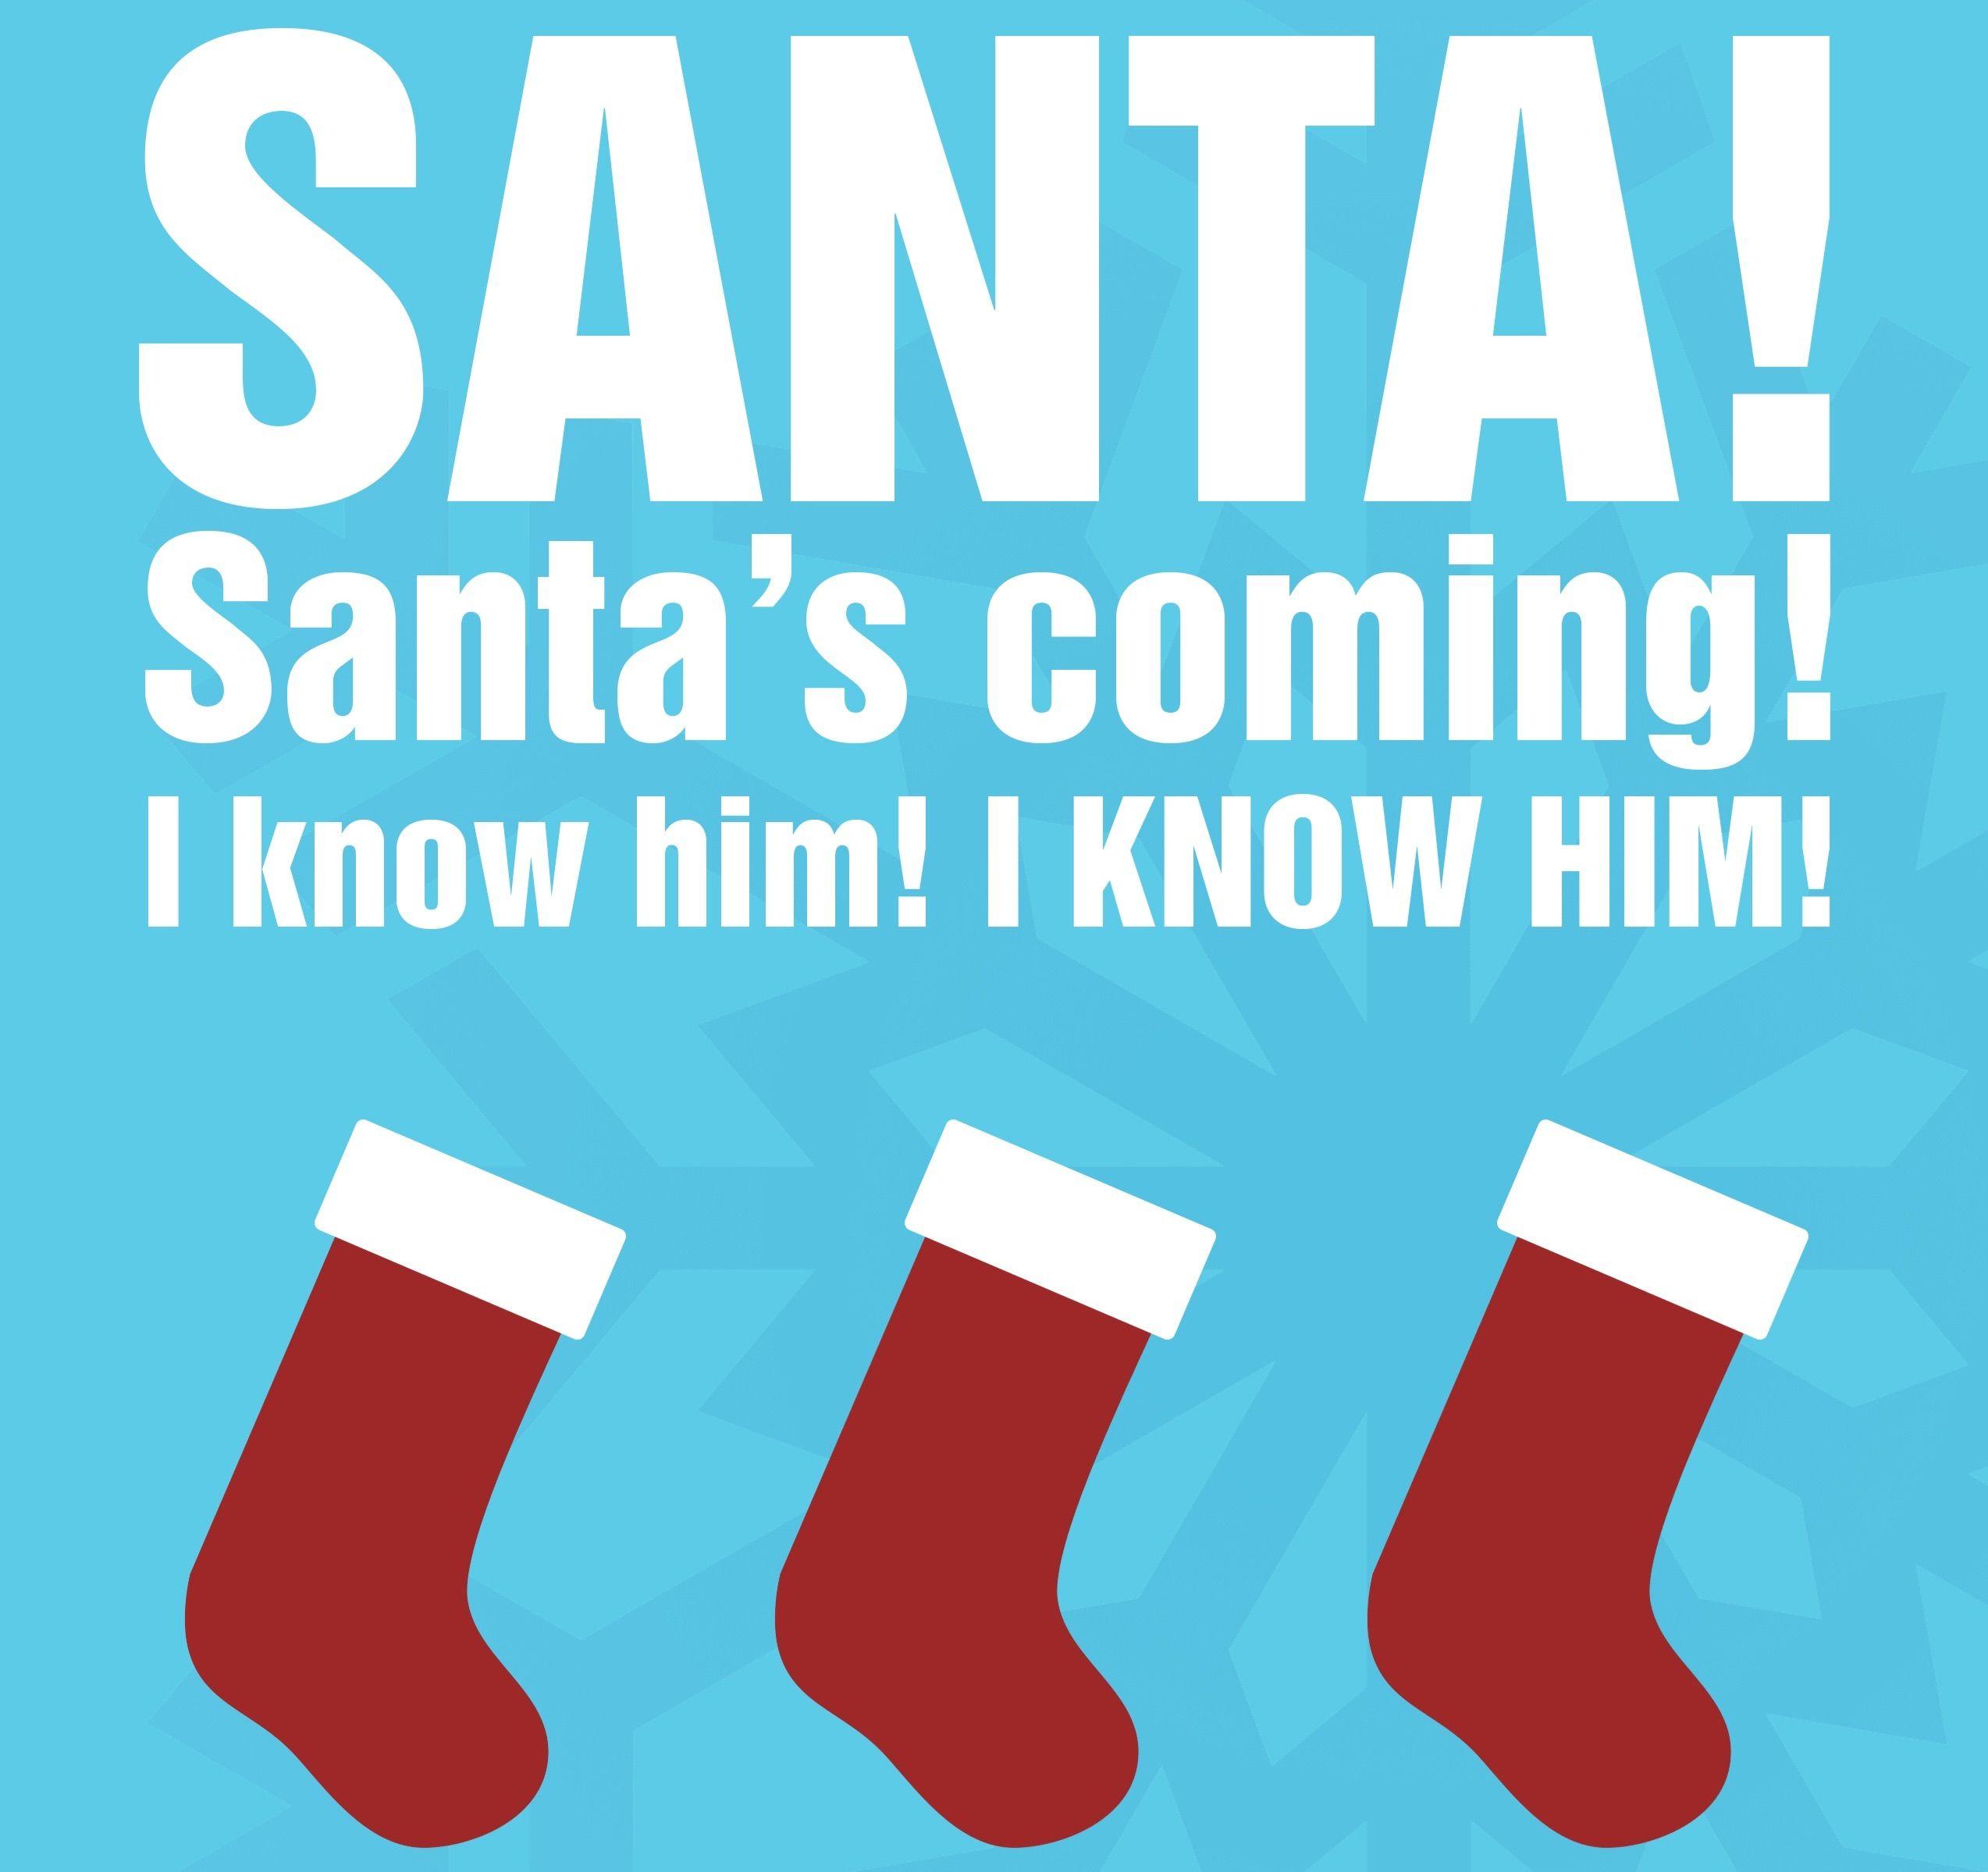 I know him! Buddy the elf quotes, Elf quotes, Elf movie